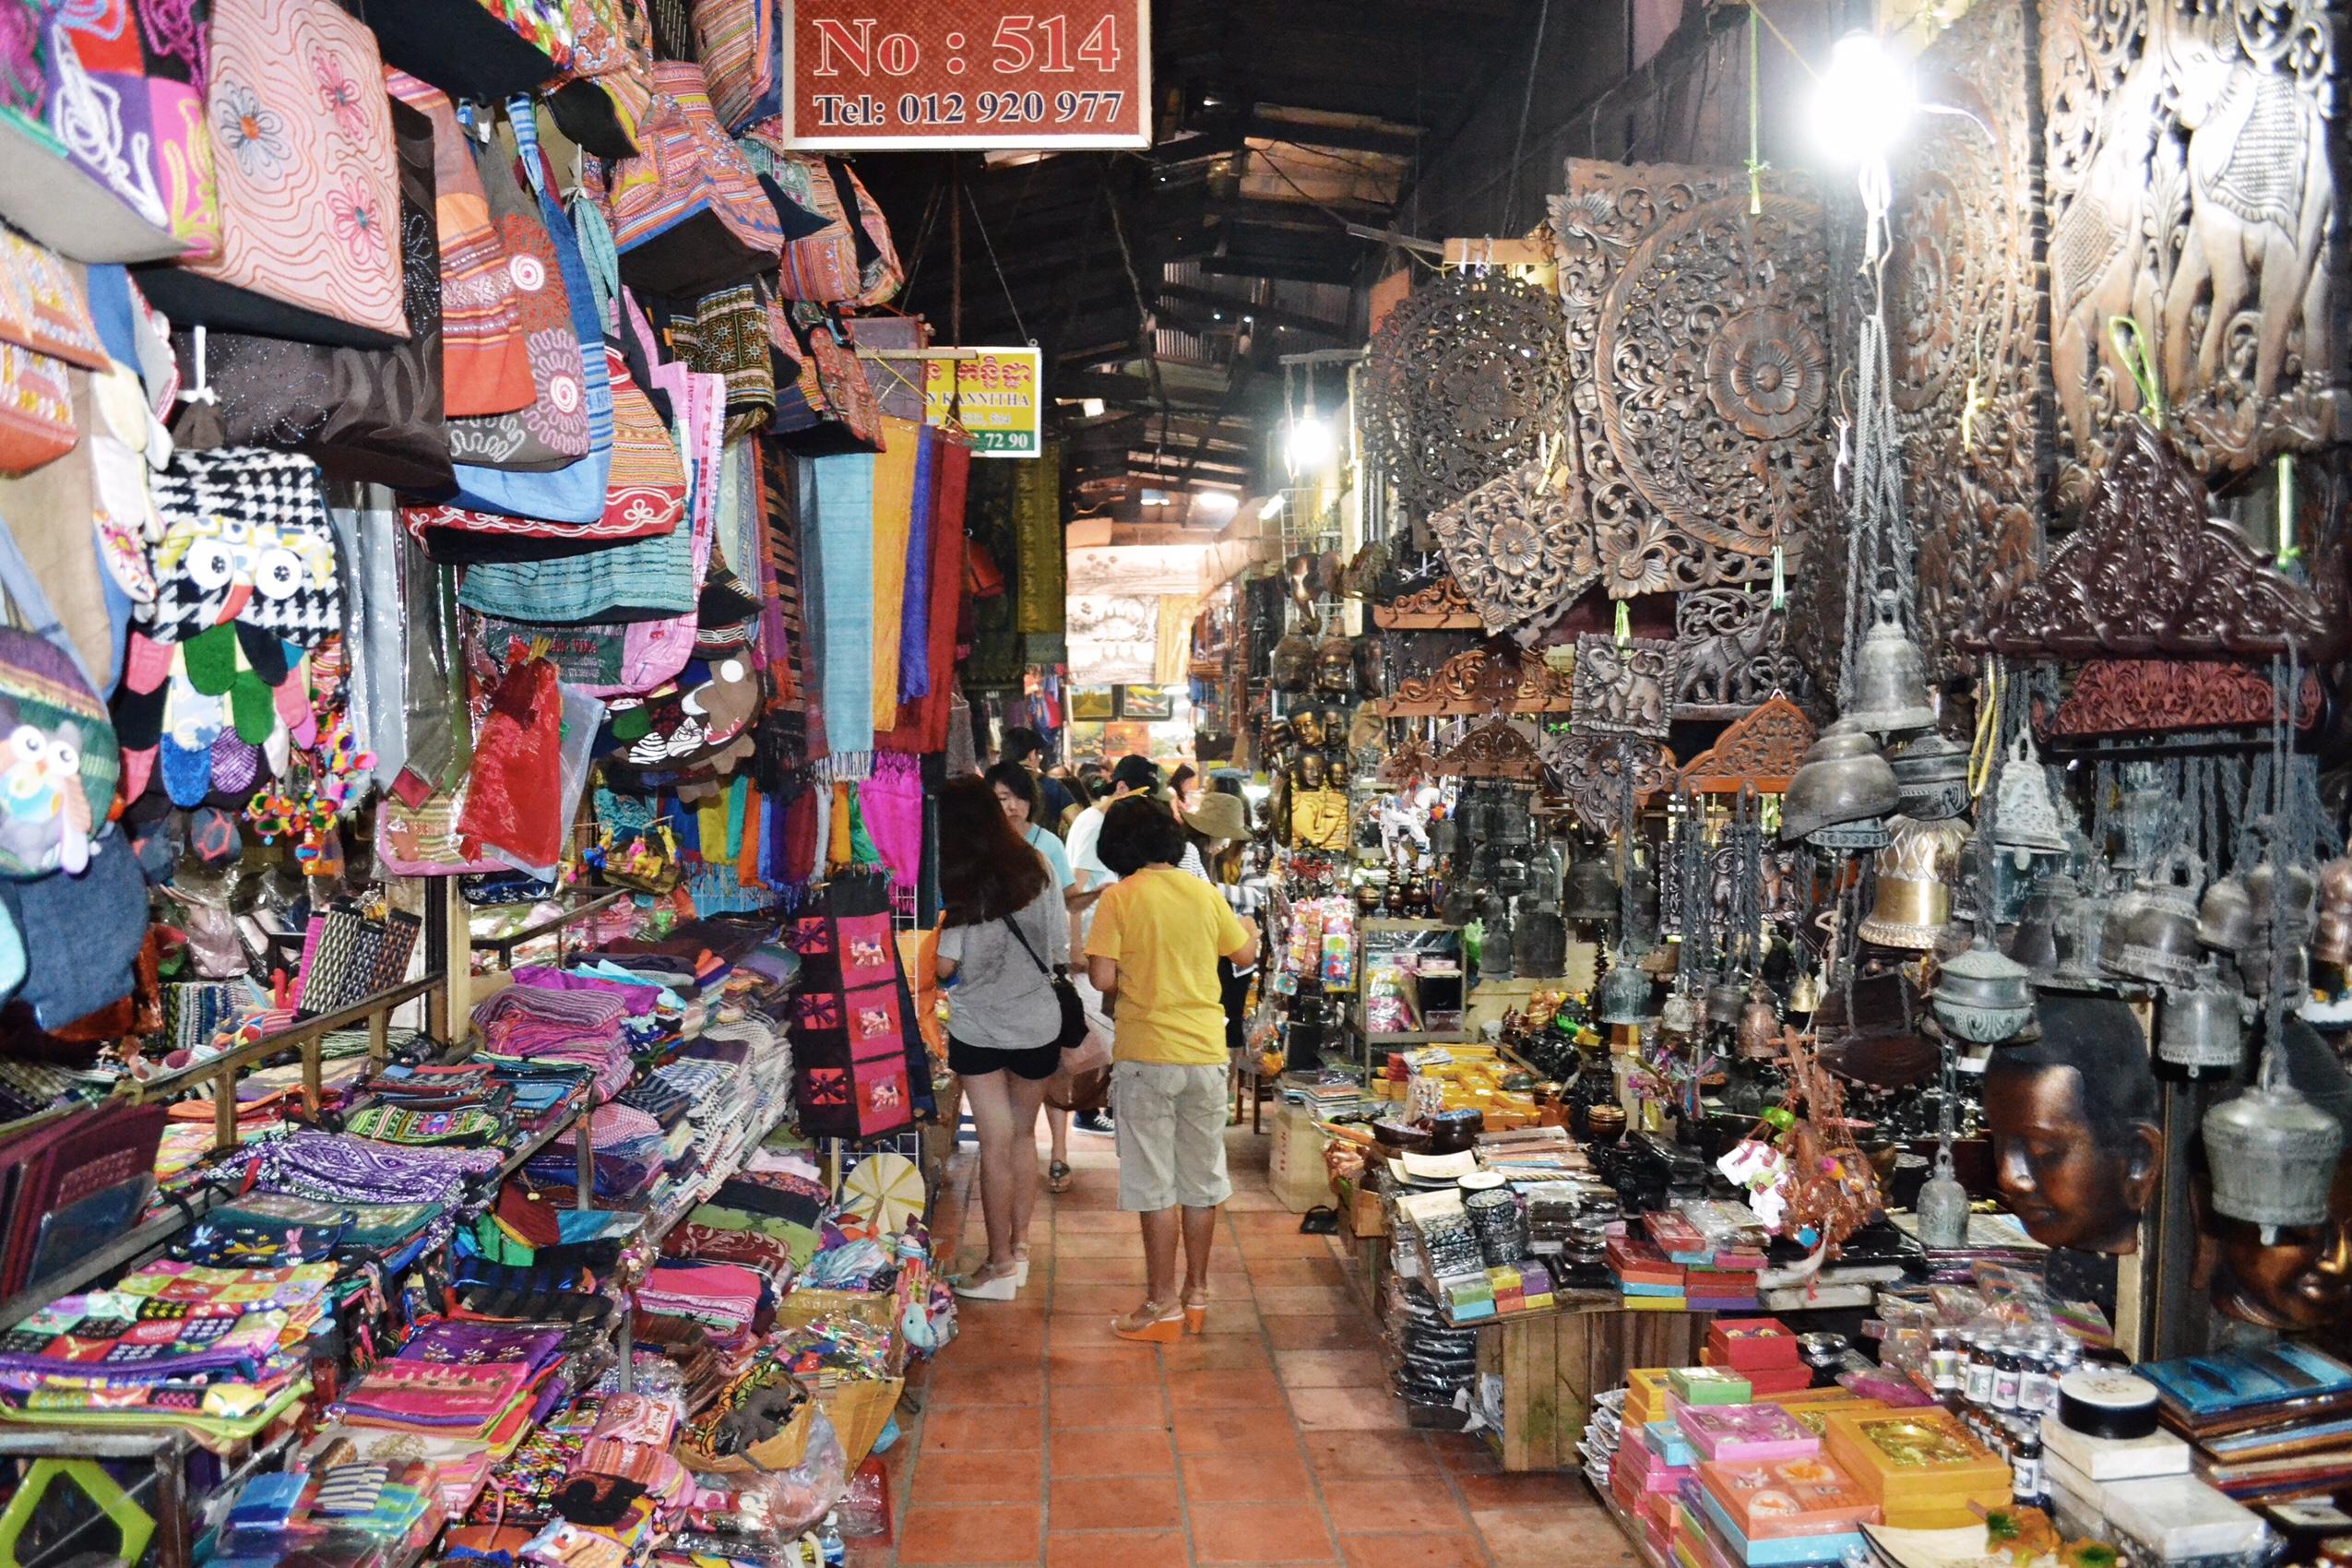 image of Russian market in Cambodia